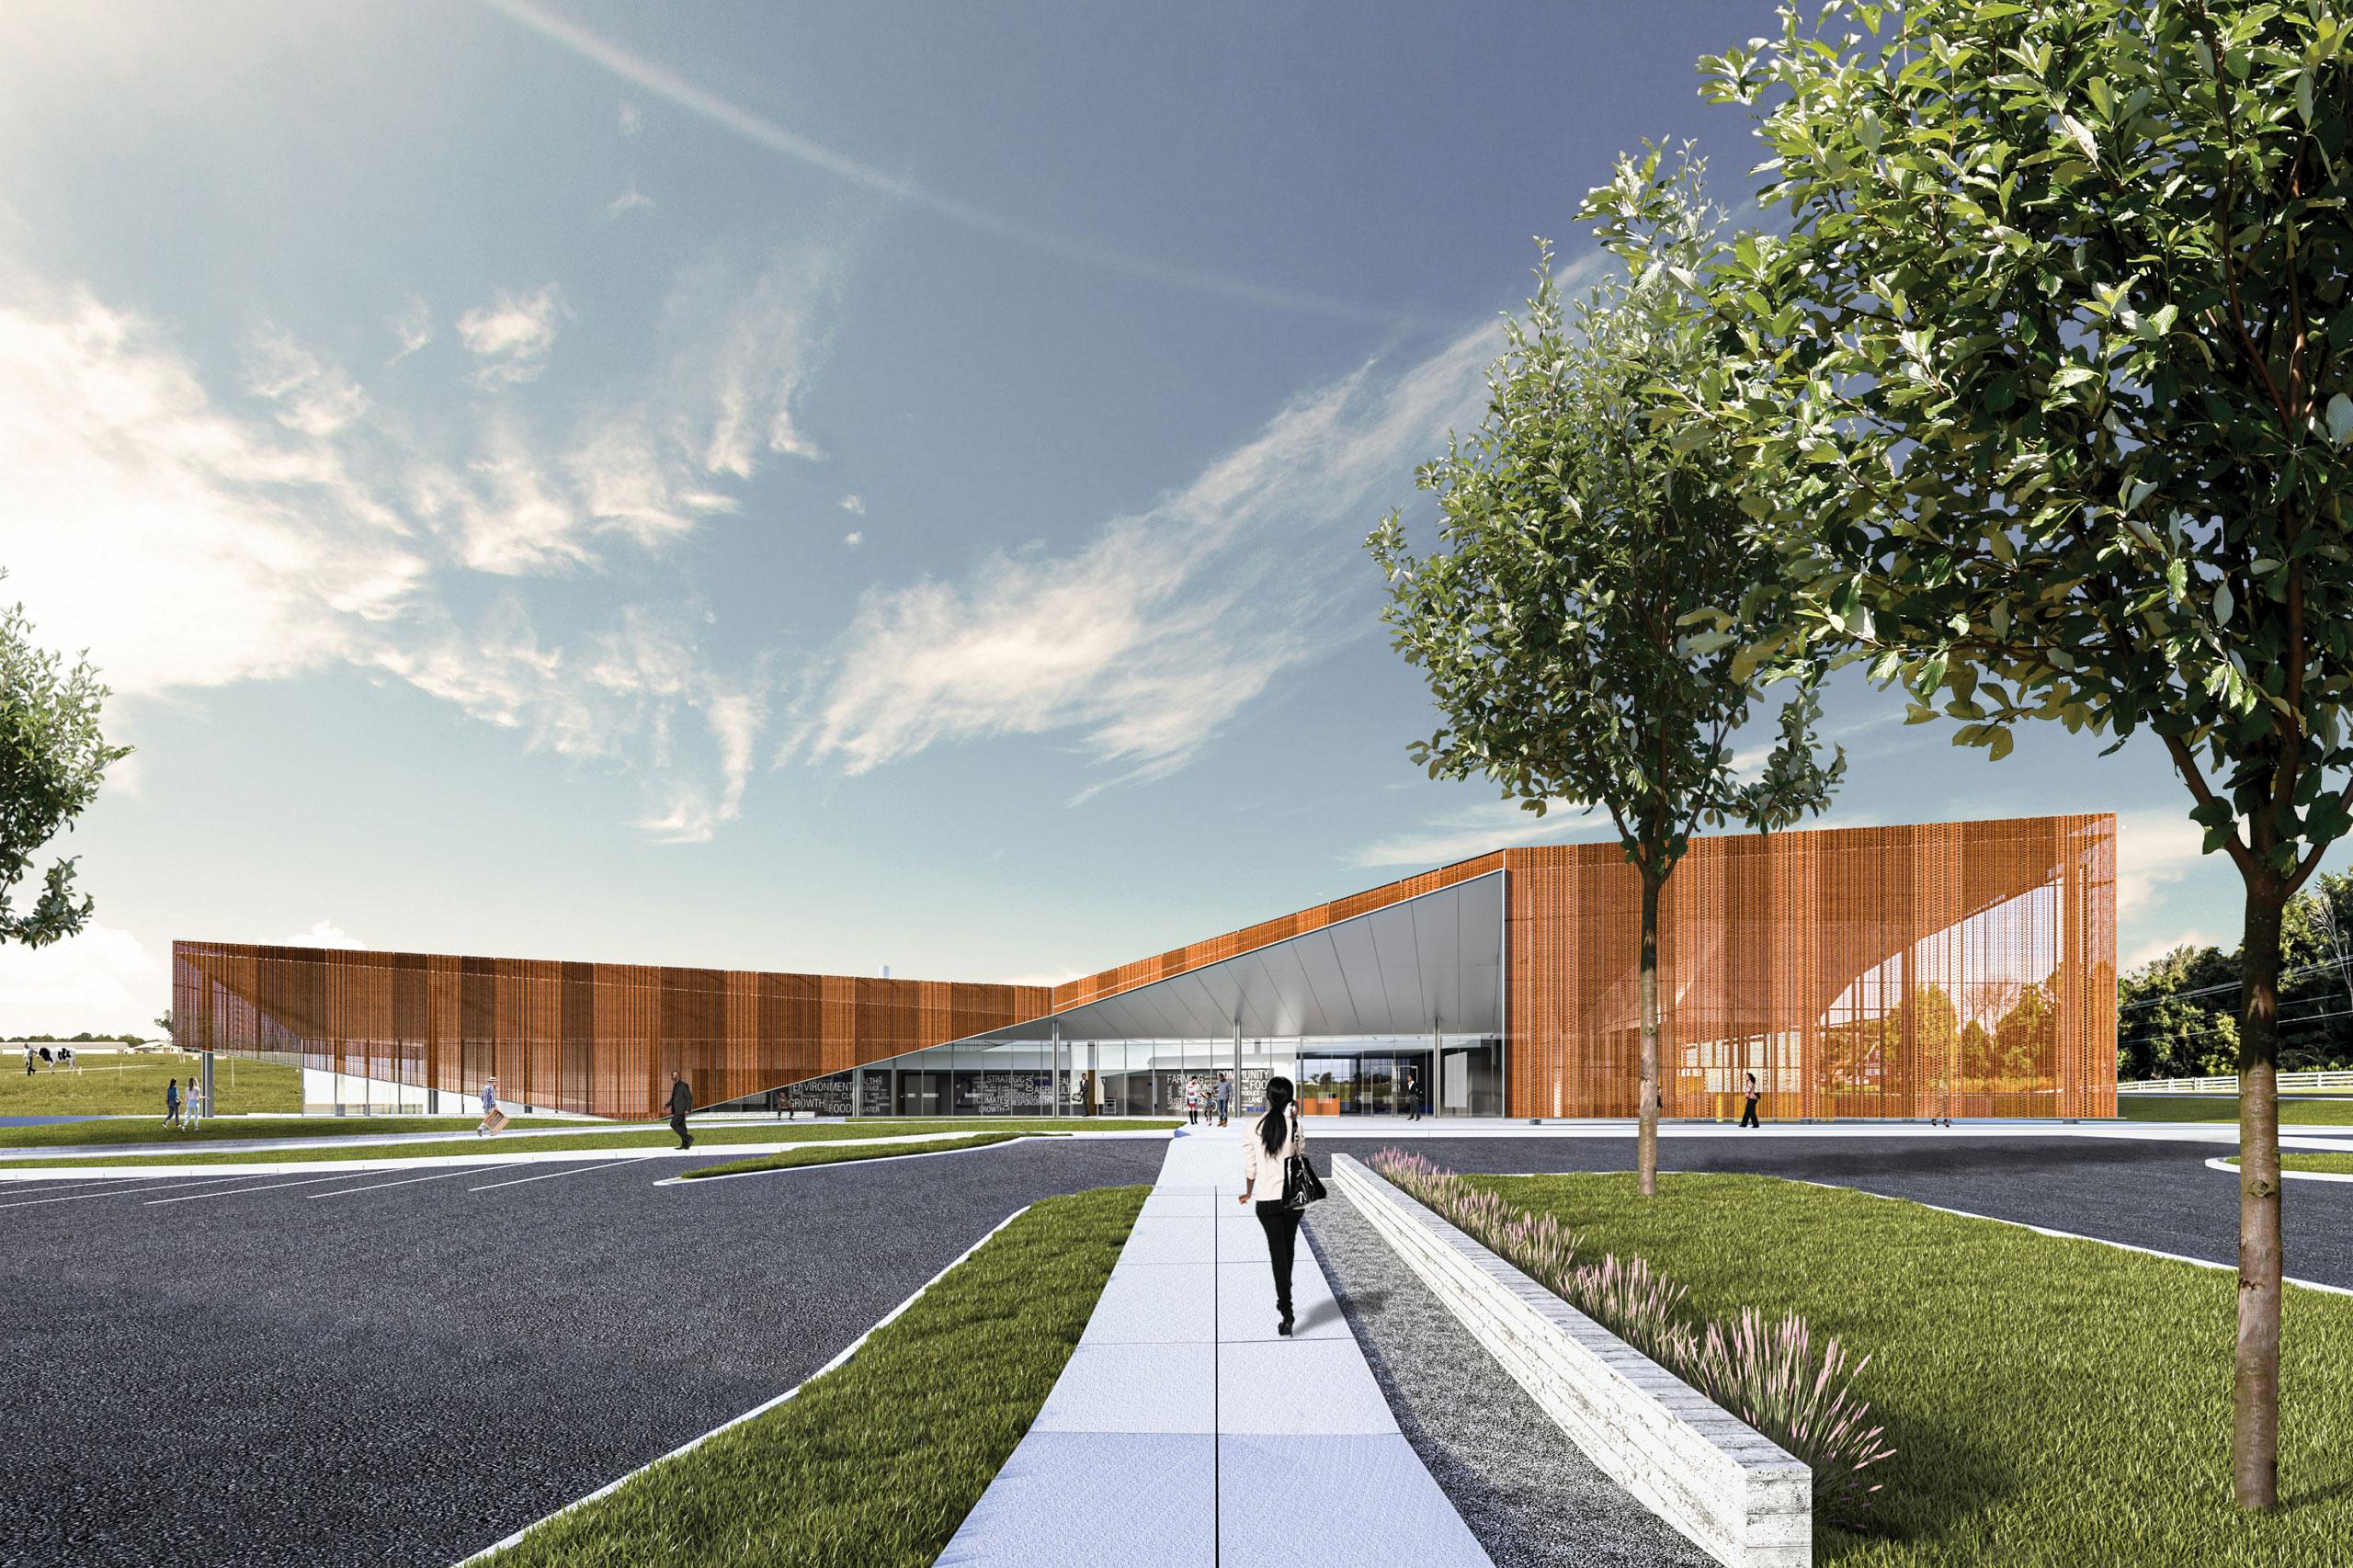 NC A&T Community and Urban Food Processing Facility wins 2021 AIA Triangle Merit Design Award